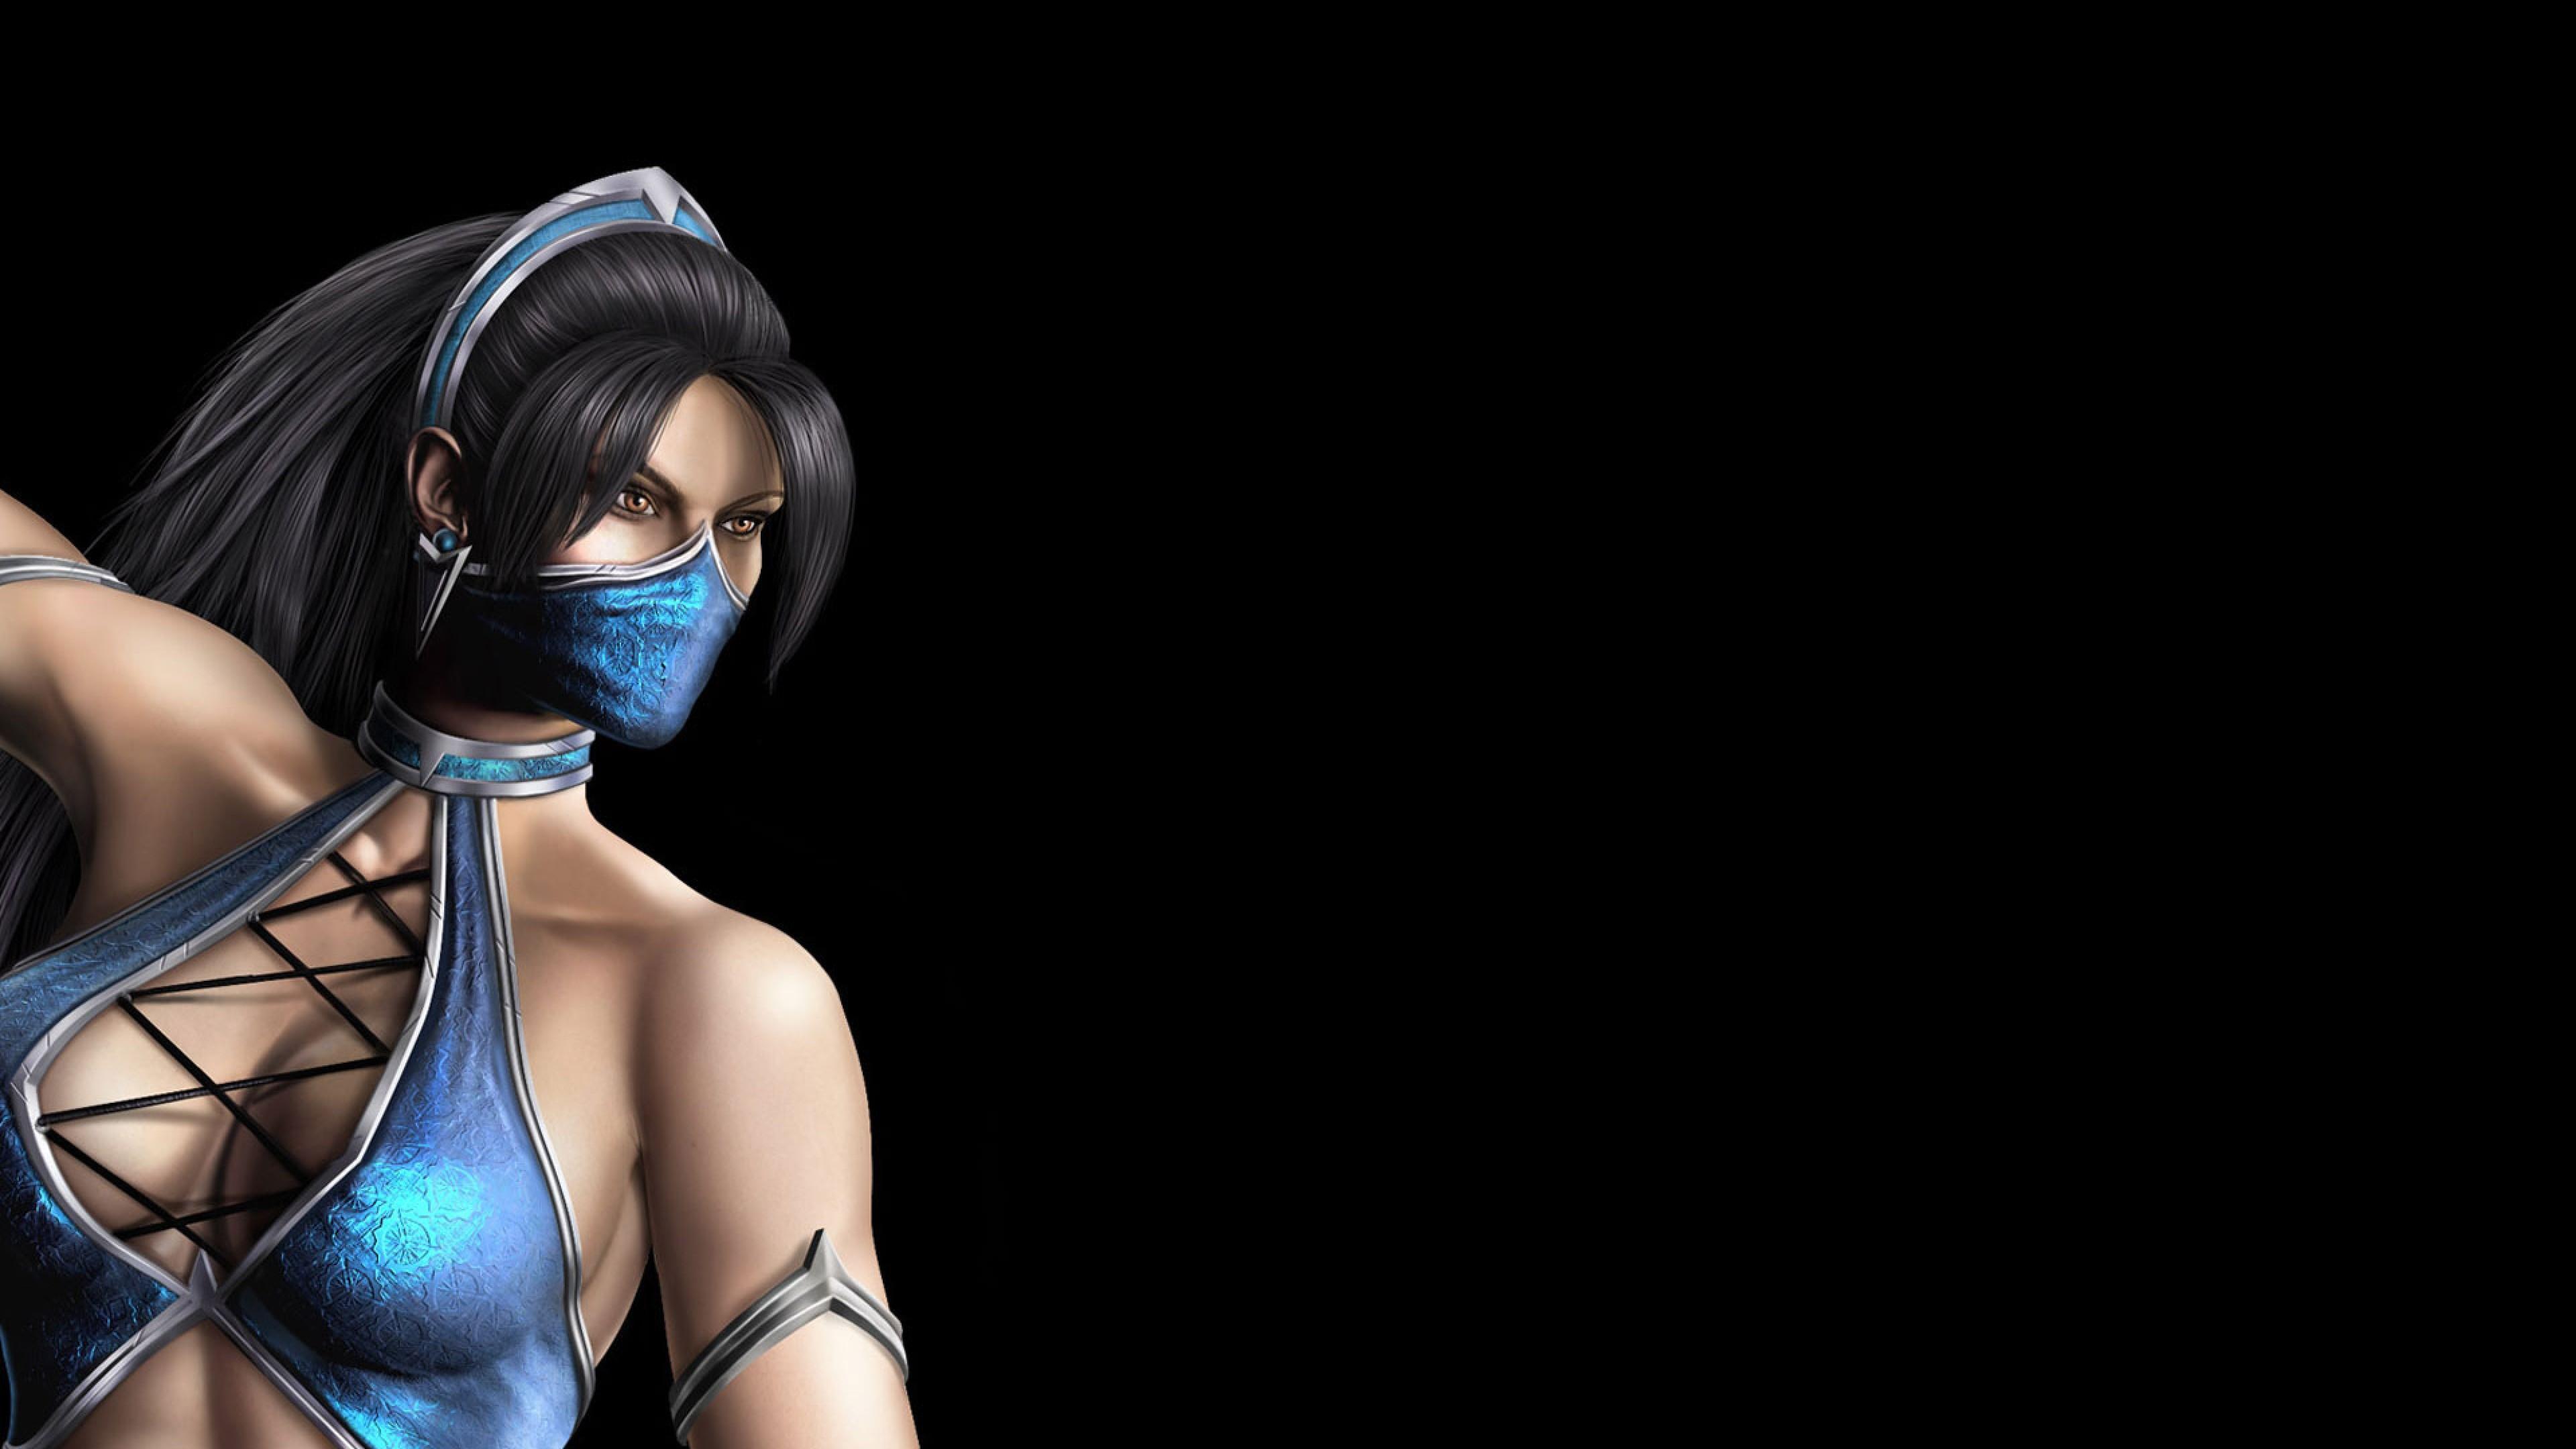 … Background 4K Ultra HD. Wallpaper kitana, princess, mortal  kombat